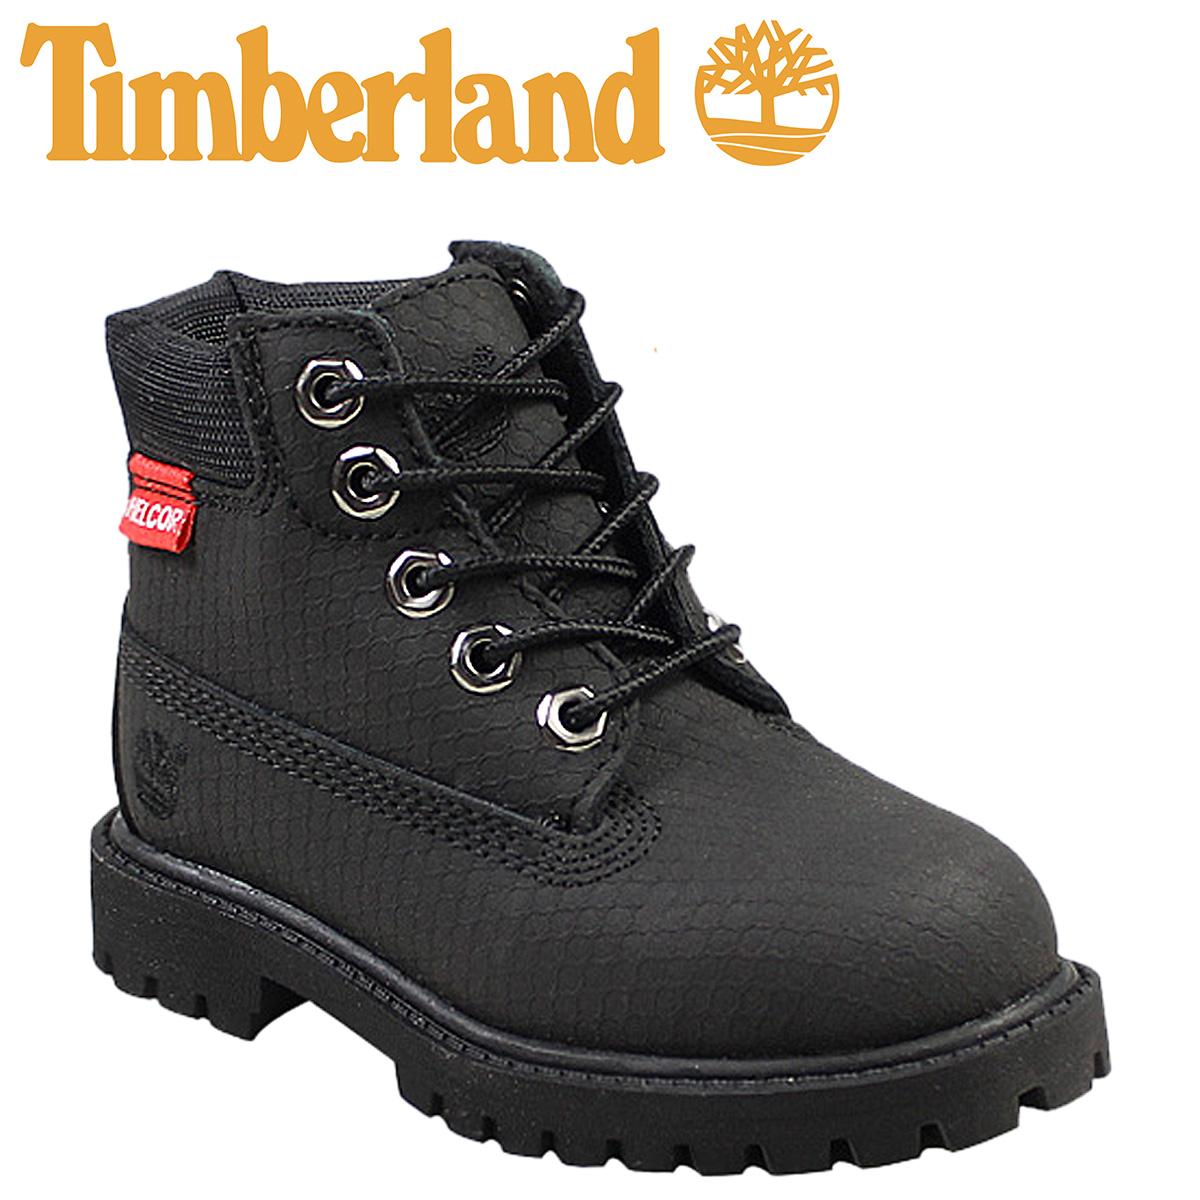 bfac907593b Timberland Timberland baby kids 6 inch premium waterproof boots 6 INCH  PREMIUM WATERPROOF HELCOR BABY TODDLERS ...